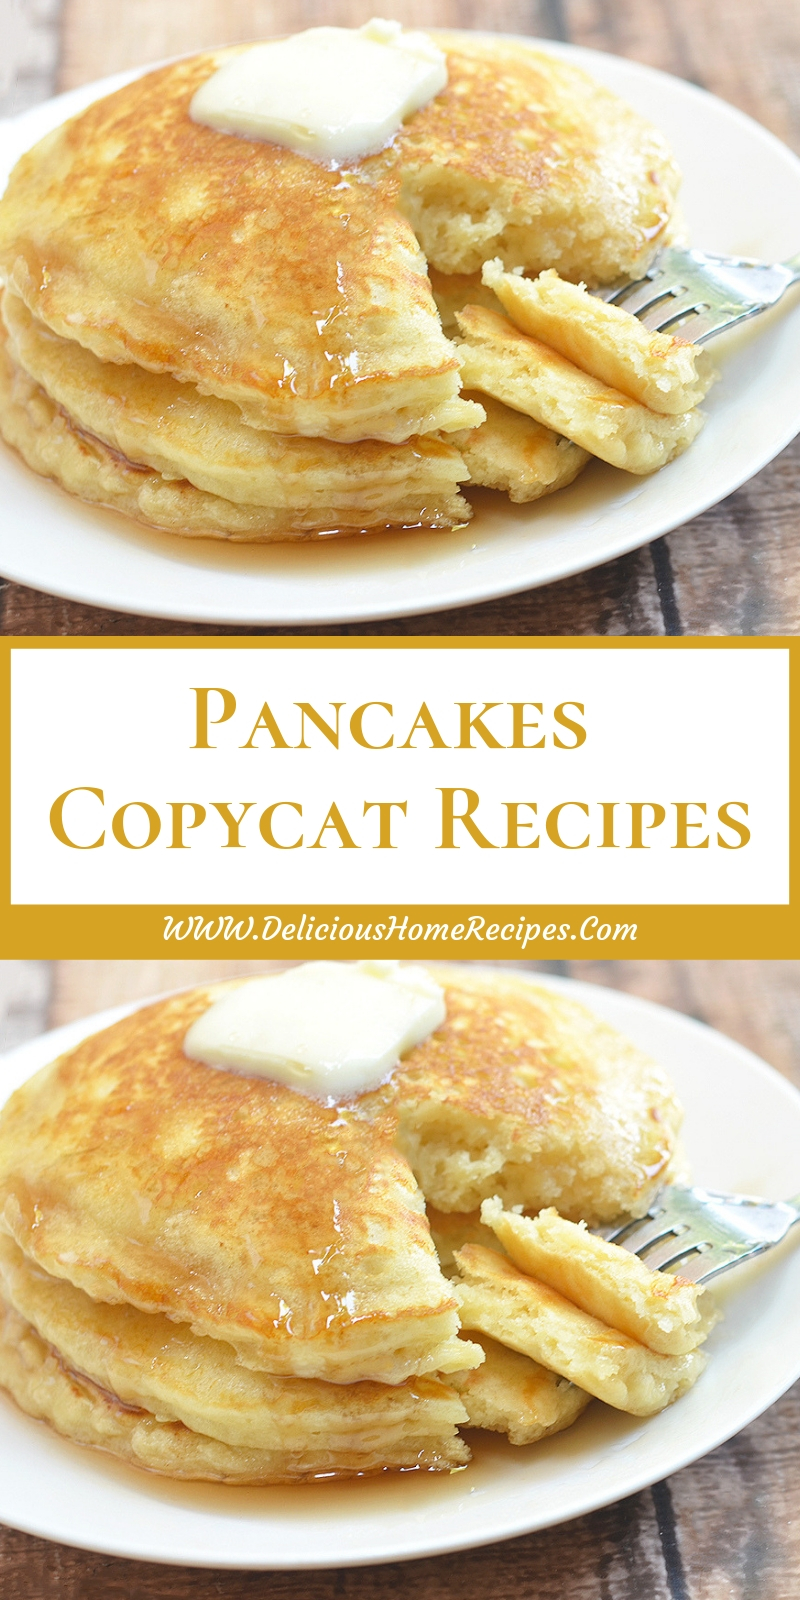 Pancakes Copycat Recipes